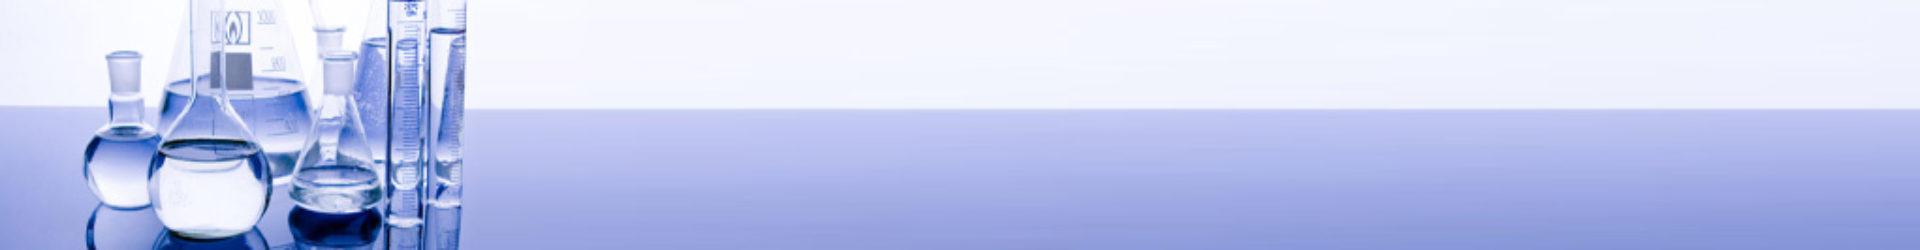 Ecotox Análise e Consultoria Ambiental - Fone: 51 3061.6784